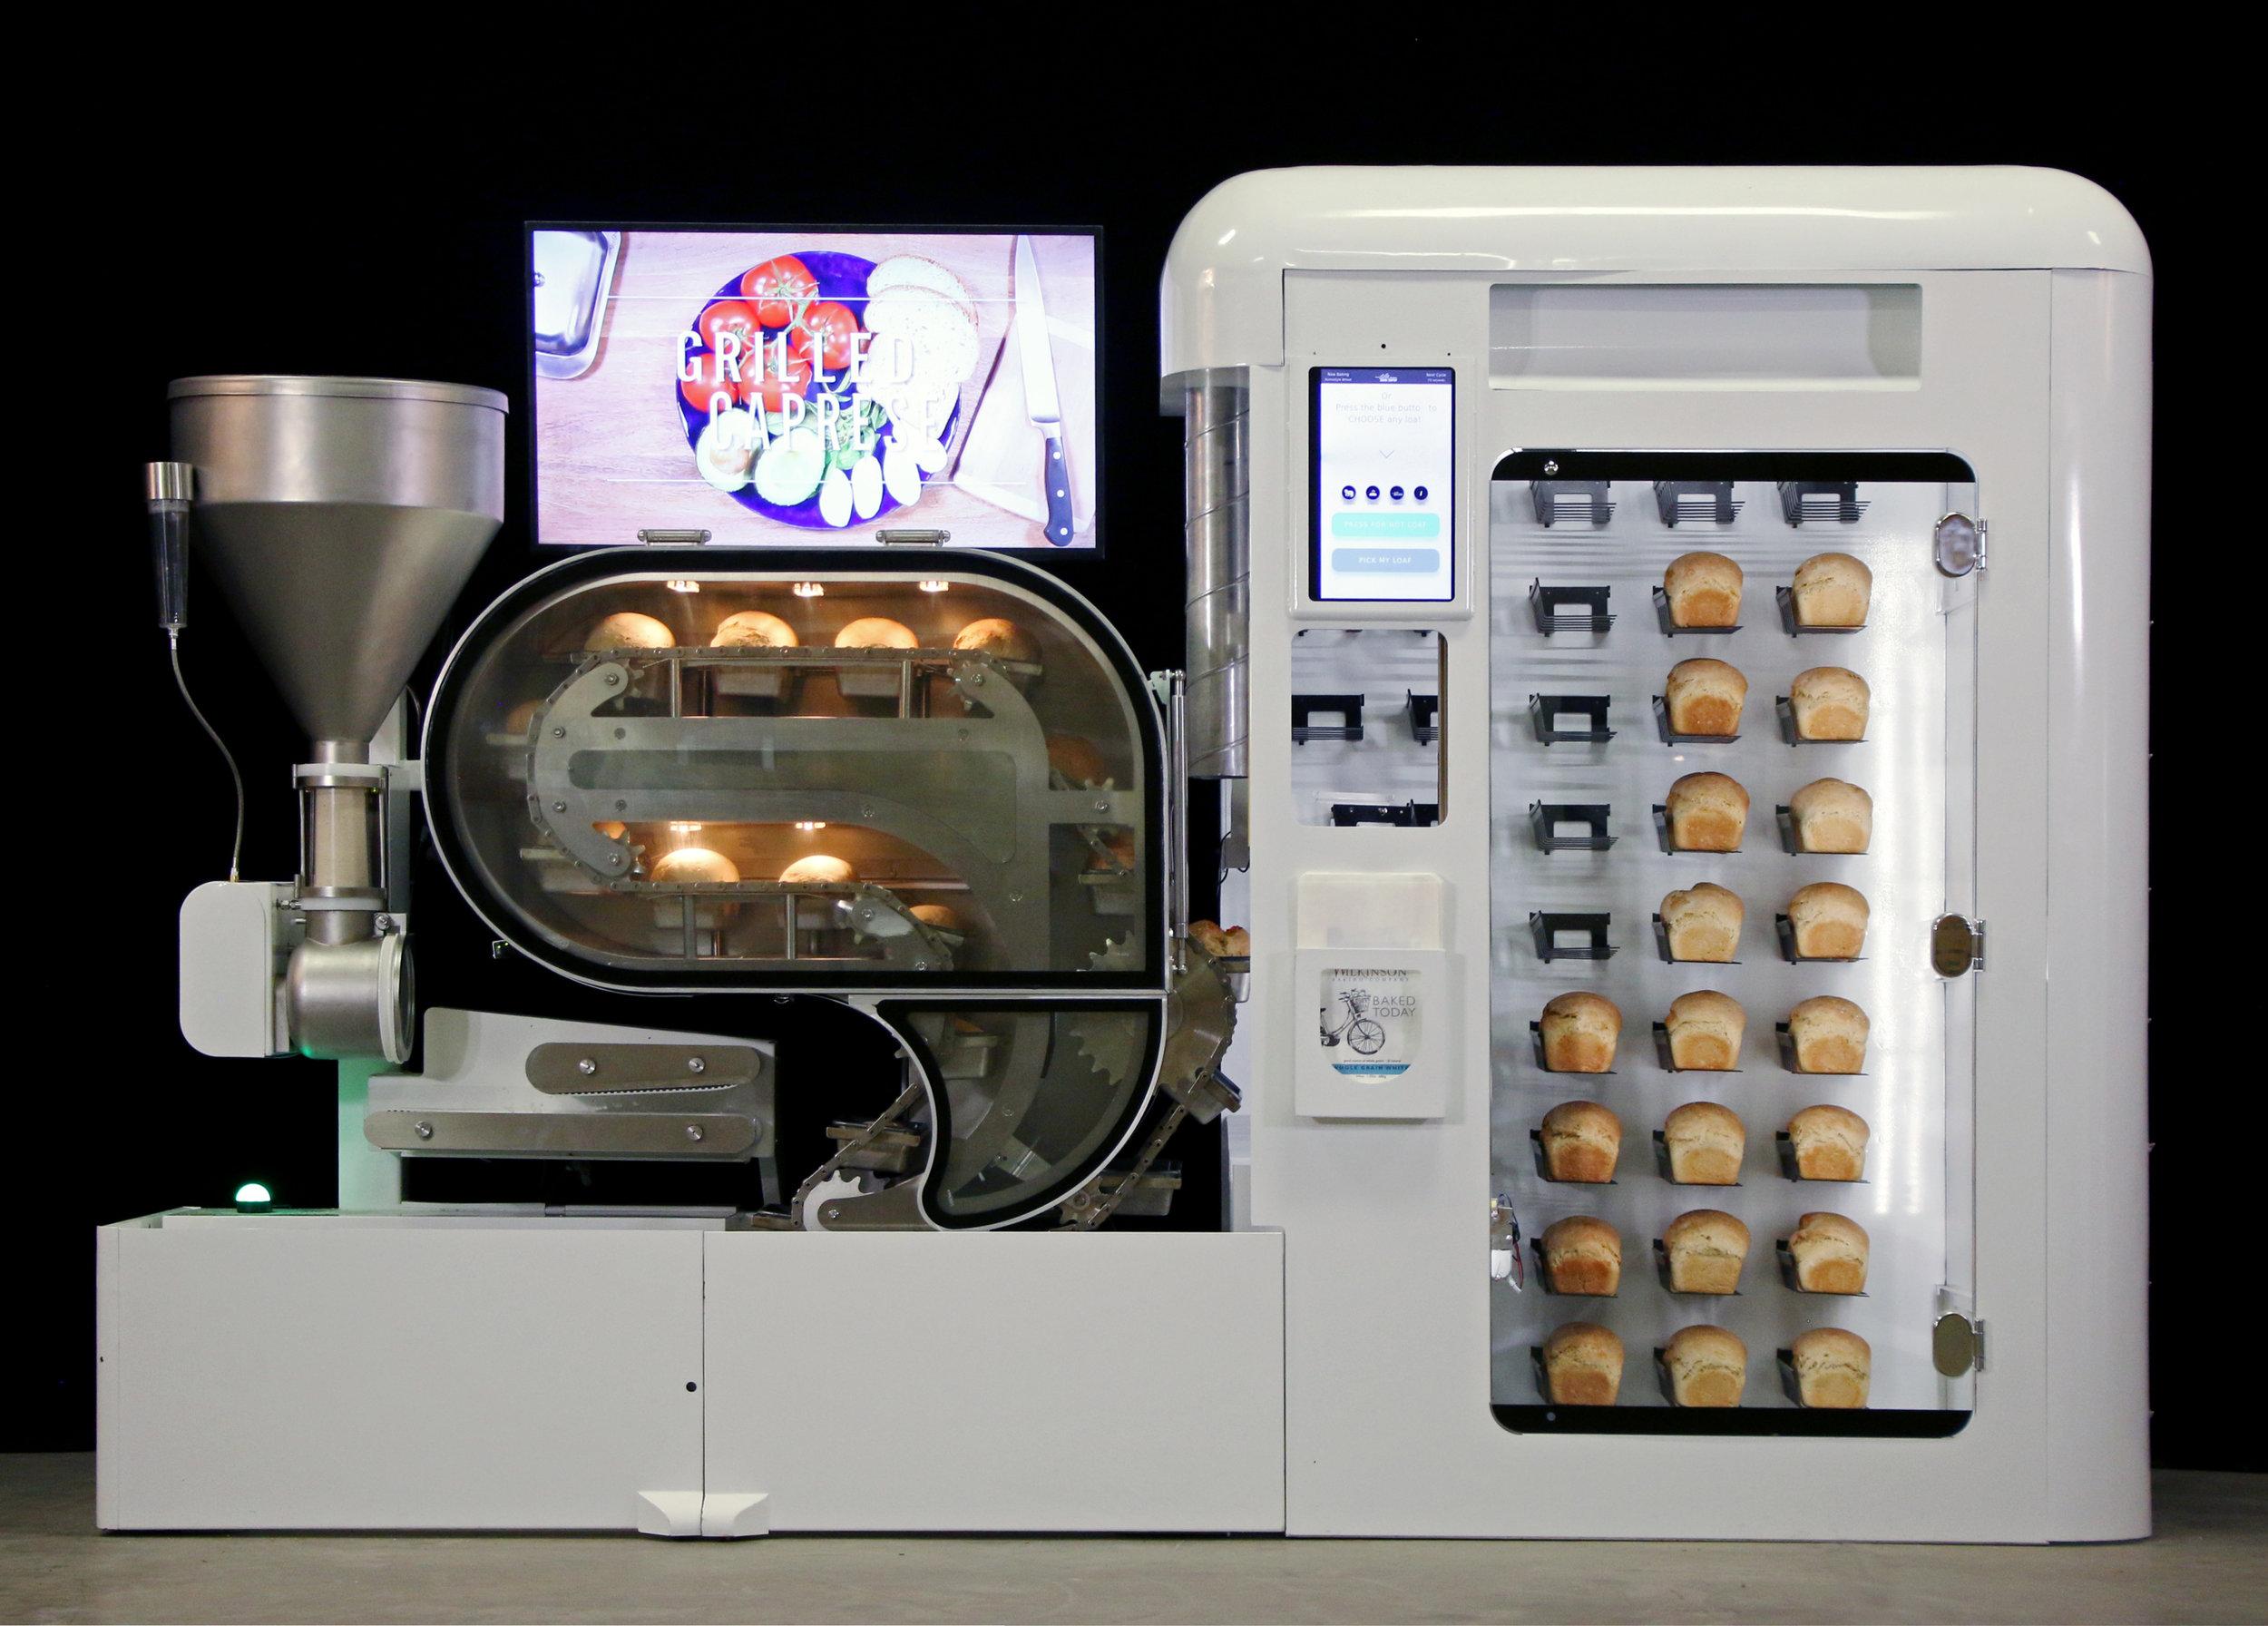 Wilkinson Baking Company Press Photo 4.jpeg